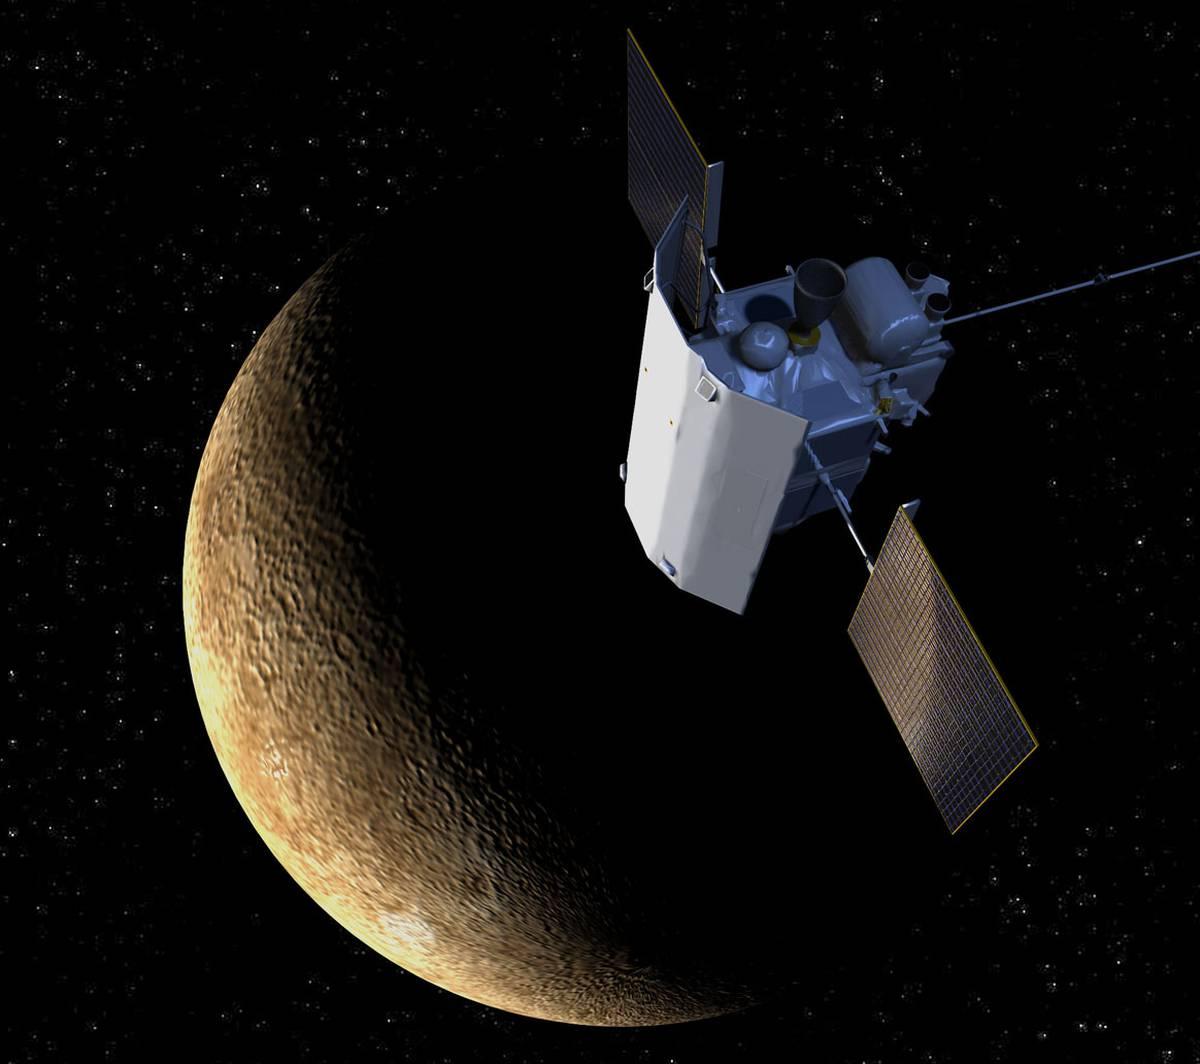 messenger spacecraft launch date - 870×771